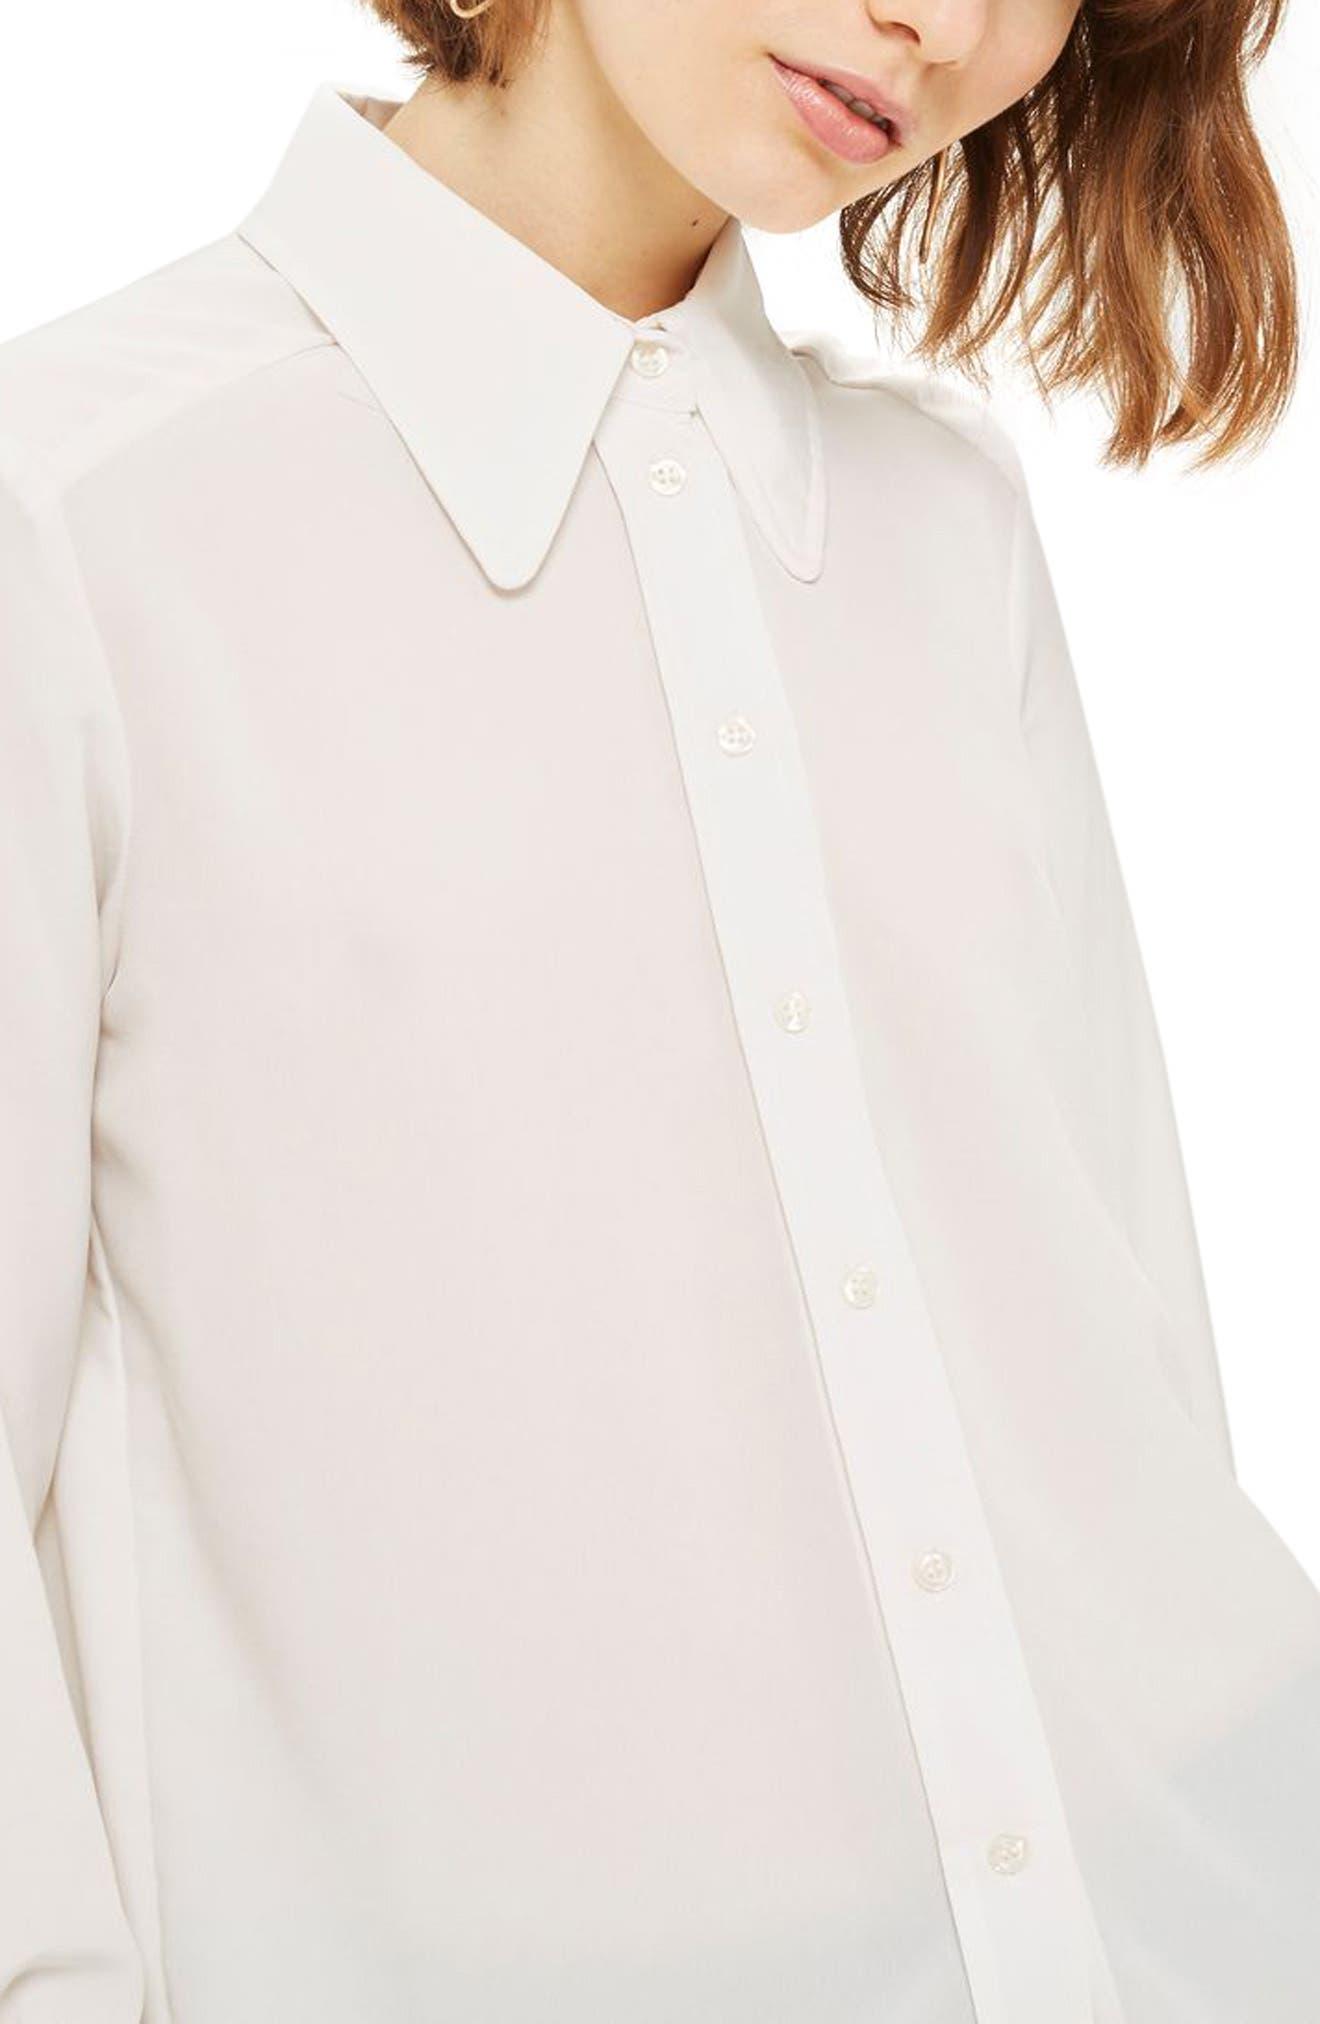 Alternate Image 1 Selected - Topshop '70s Collar Shirt